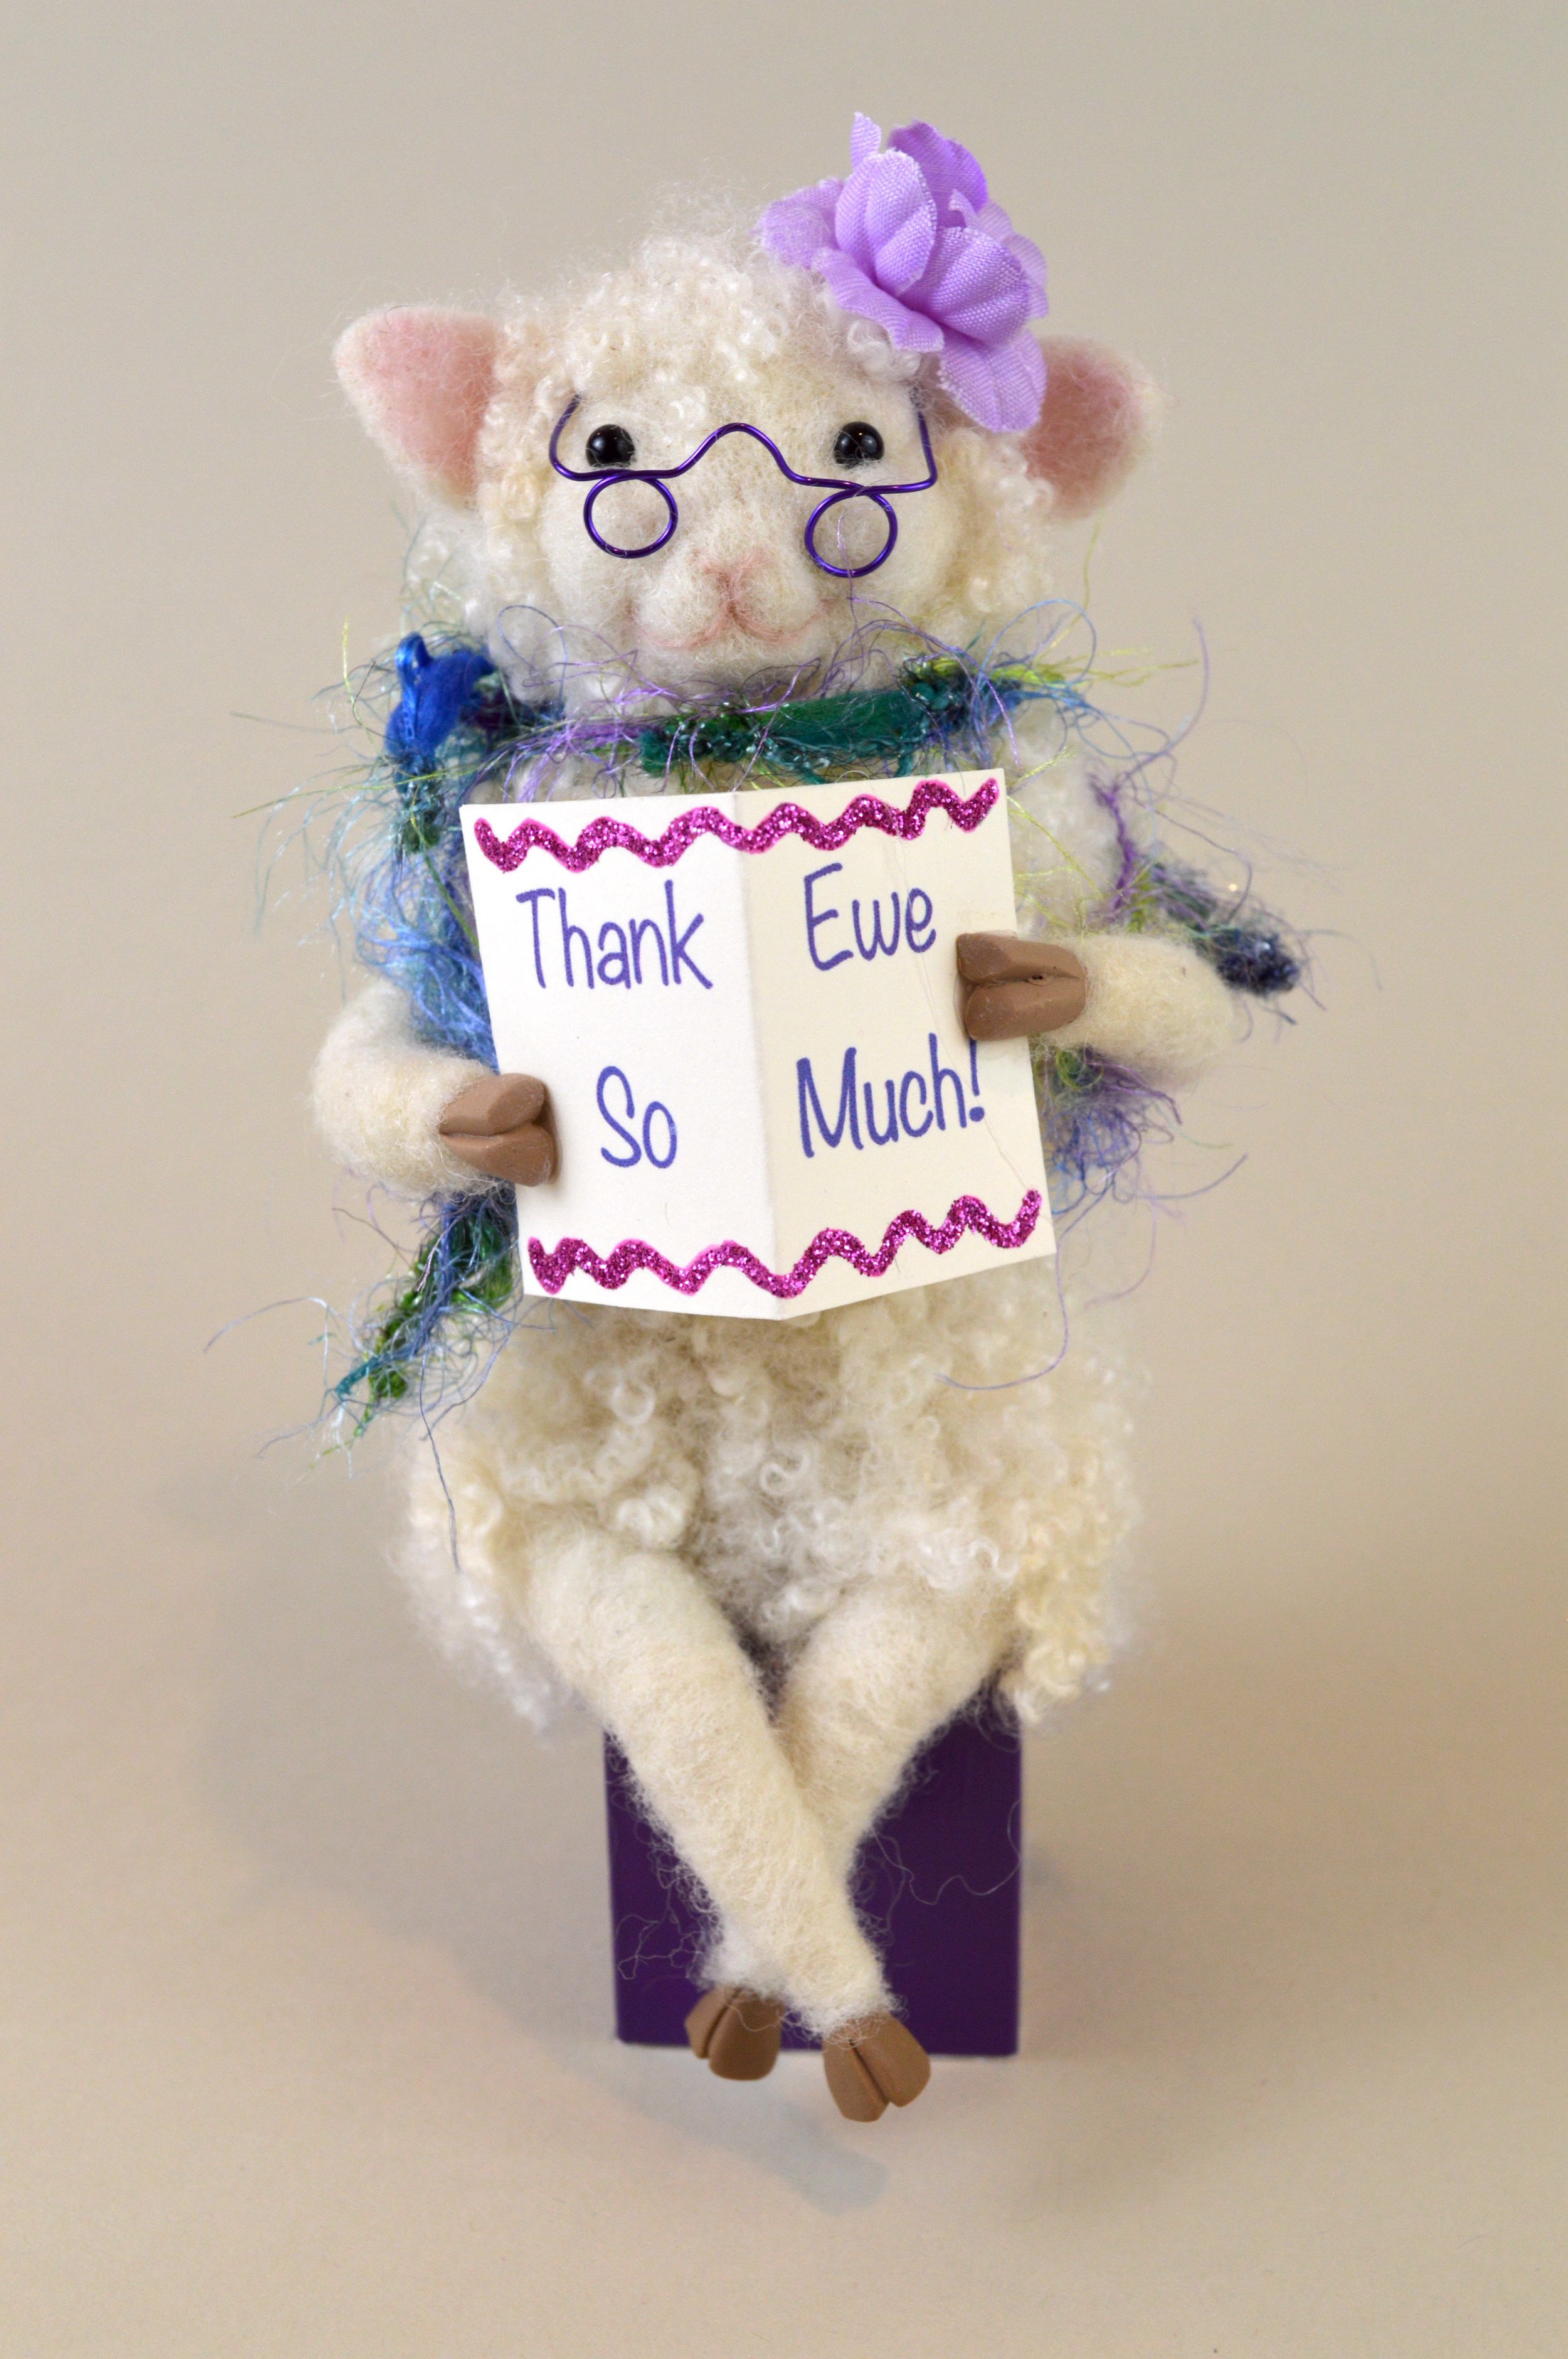 Thank Ewe So Much (in Purple)